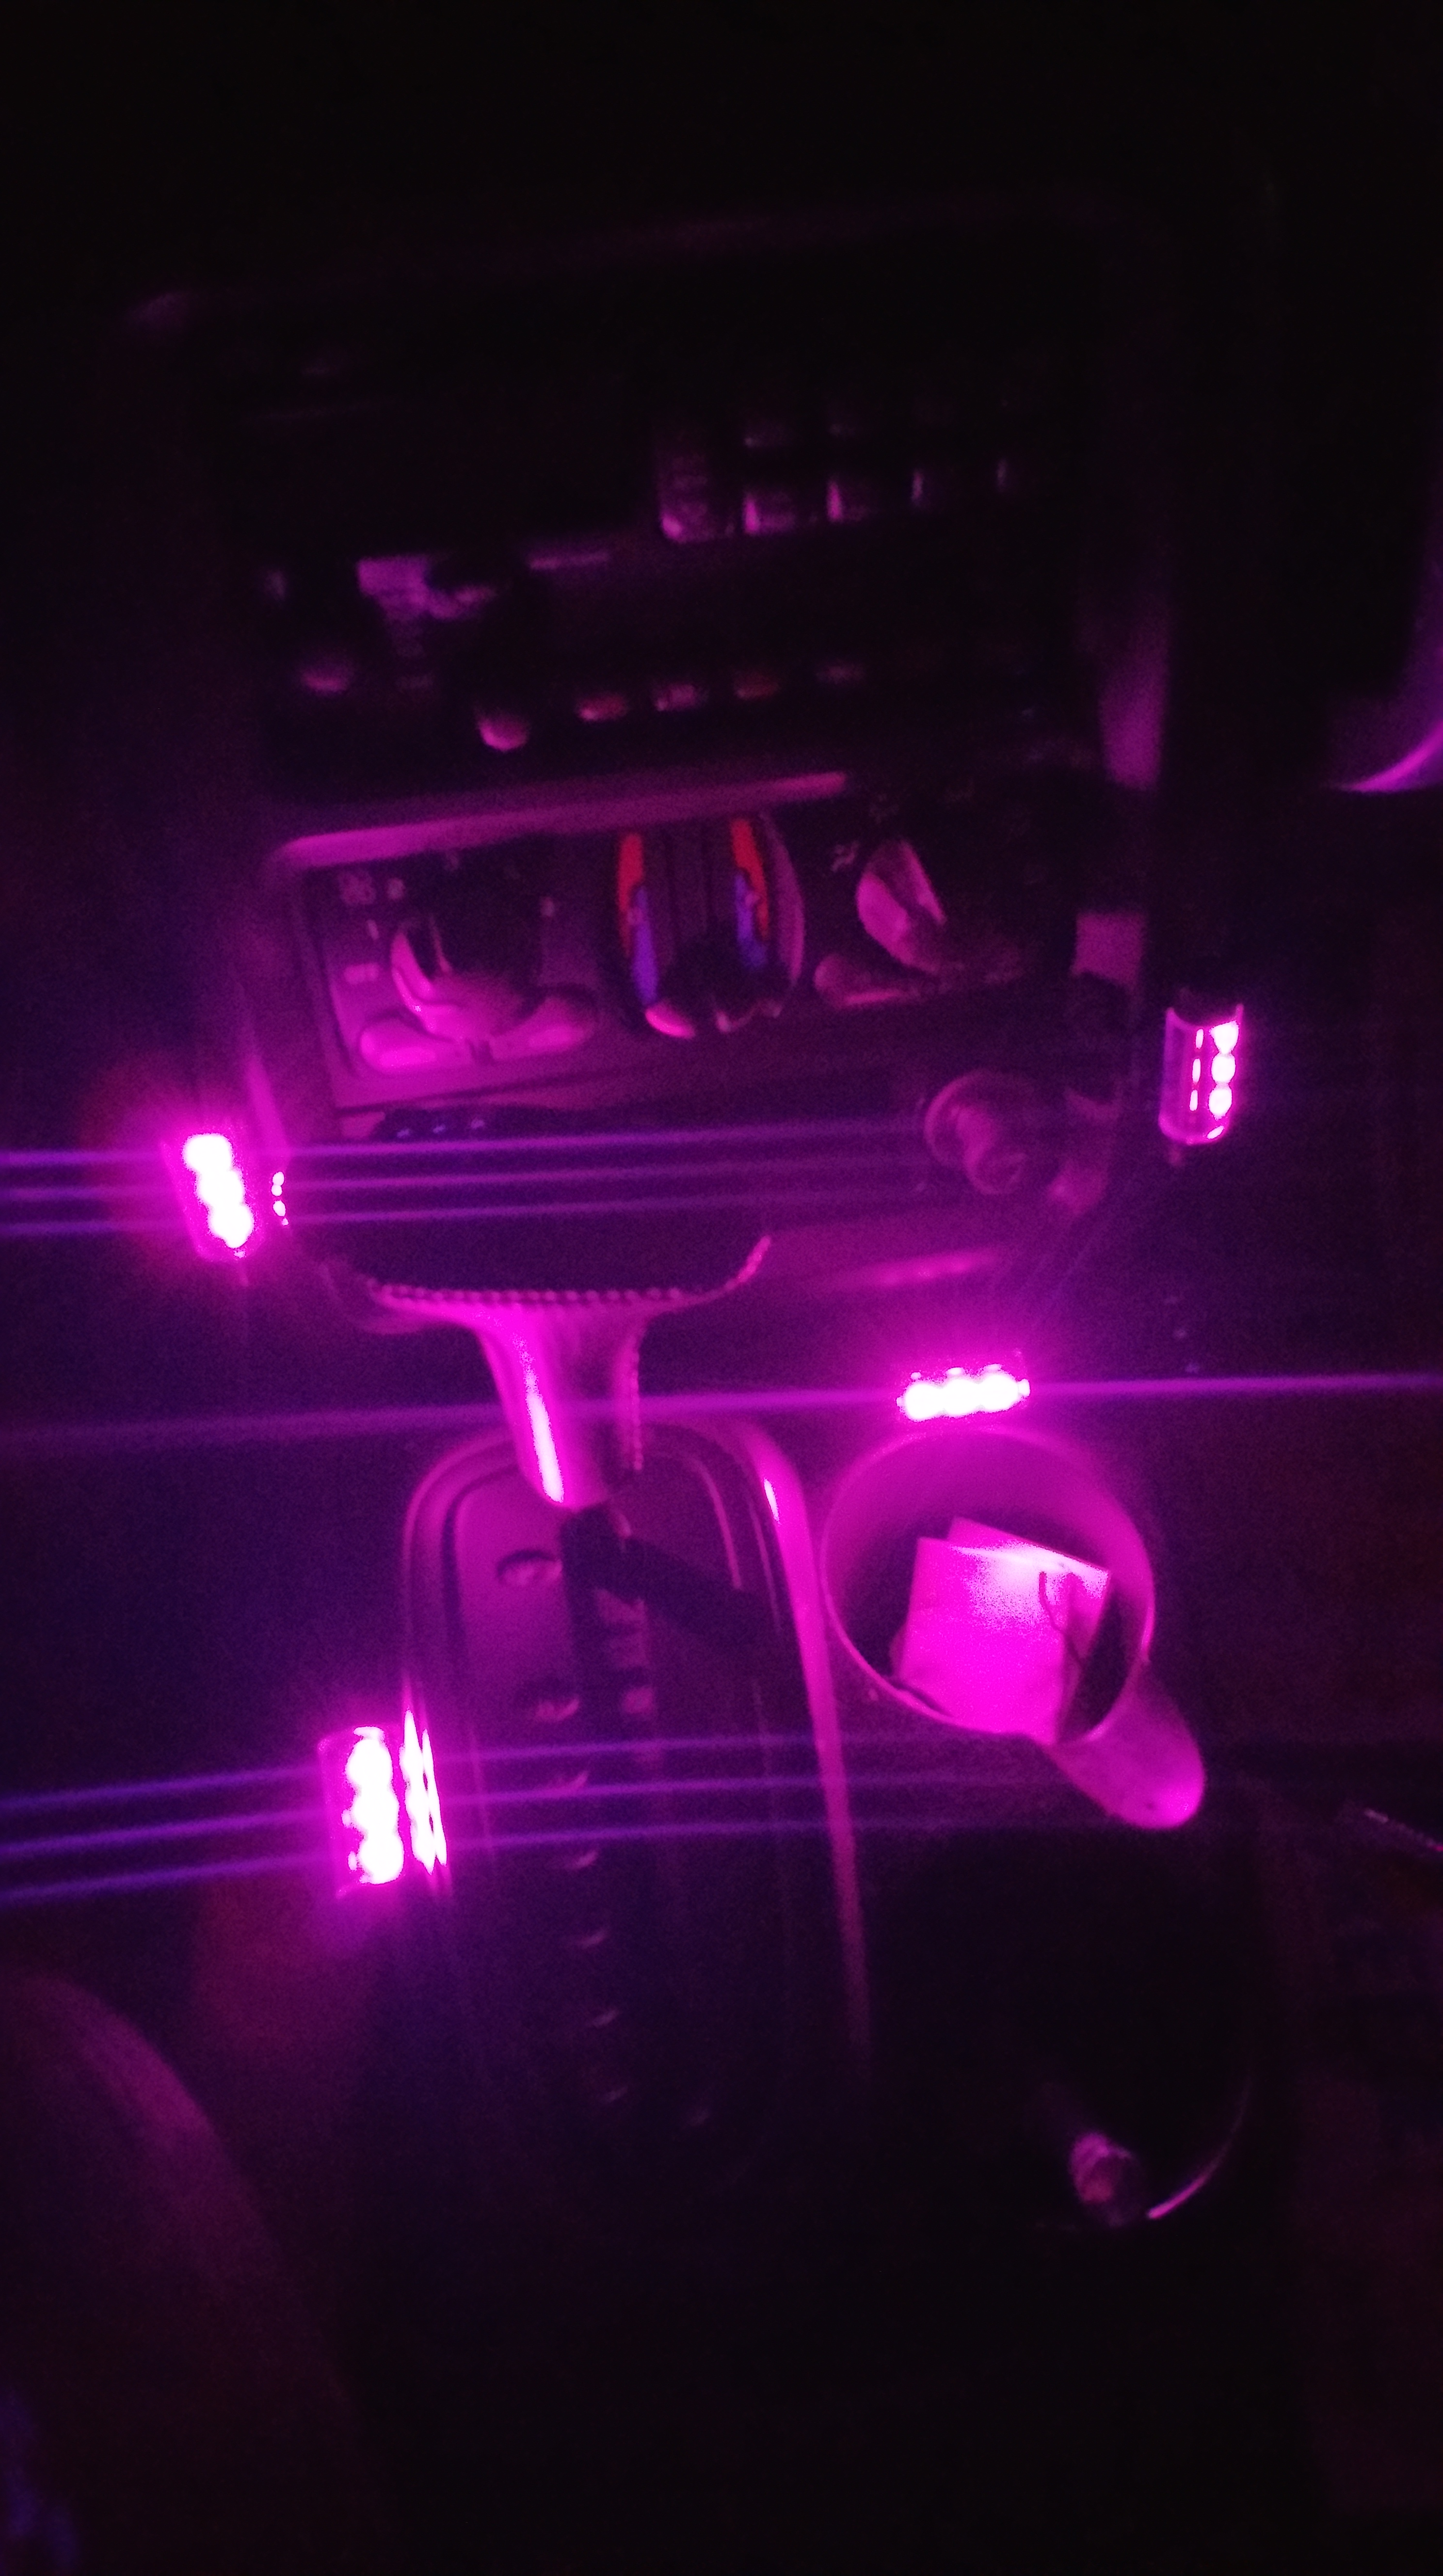 hamist 4 x 3led car charge 12v glow interior decorative 4in1 atmosphere light lamp pink money. Black Bedroom Furniture Sets. Home Design Ideas